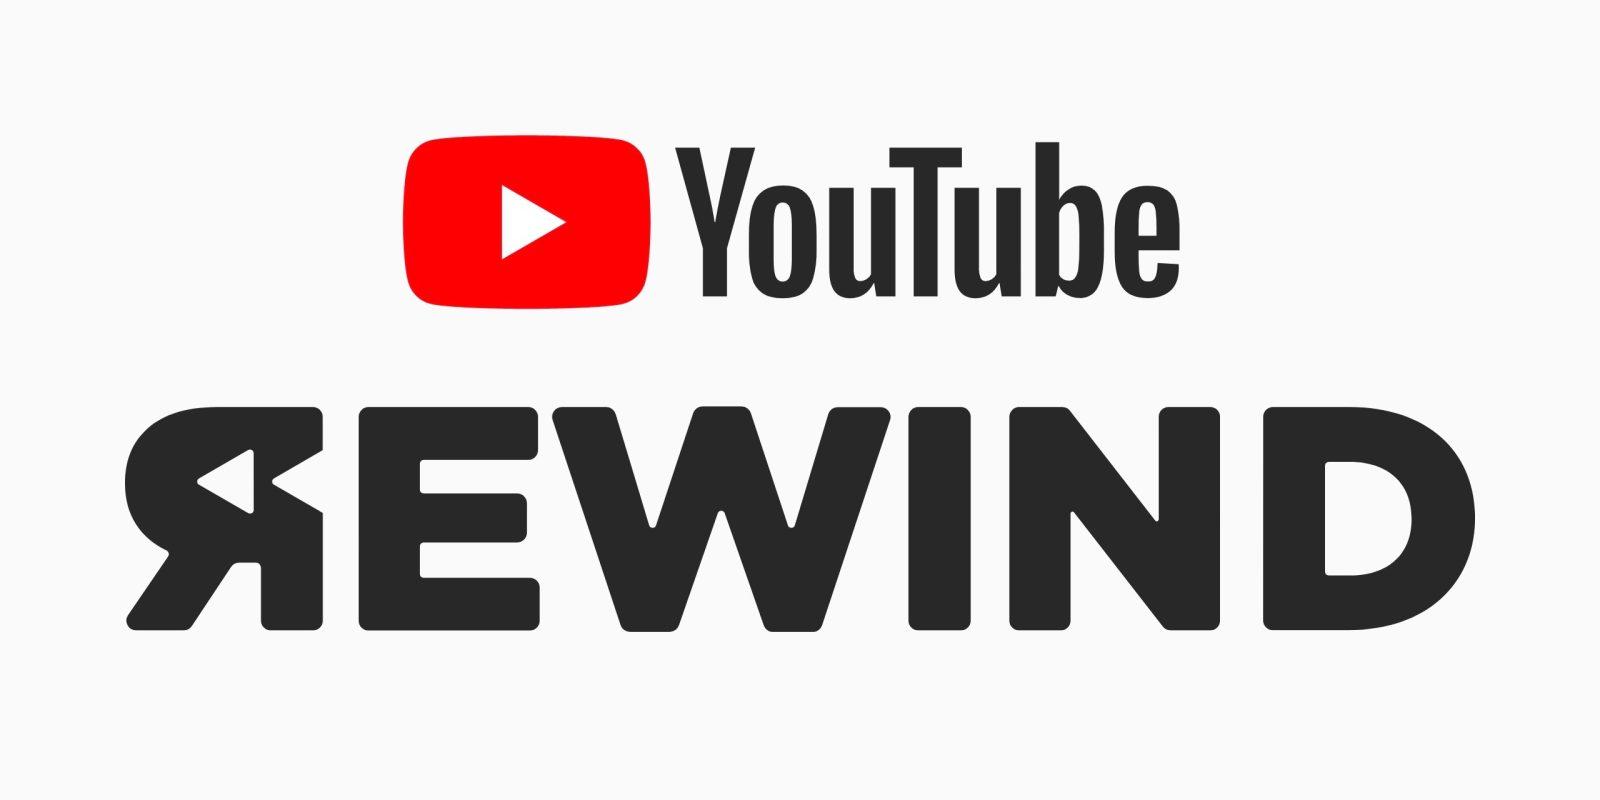 Youtube Rewind 2018 Recaps The Year Reveals Top Trending Videos 9to5google